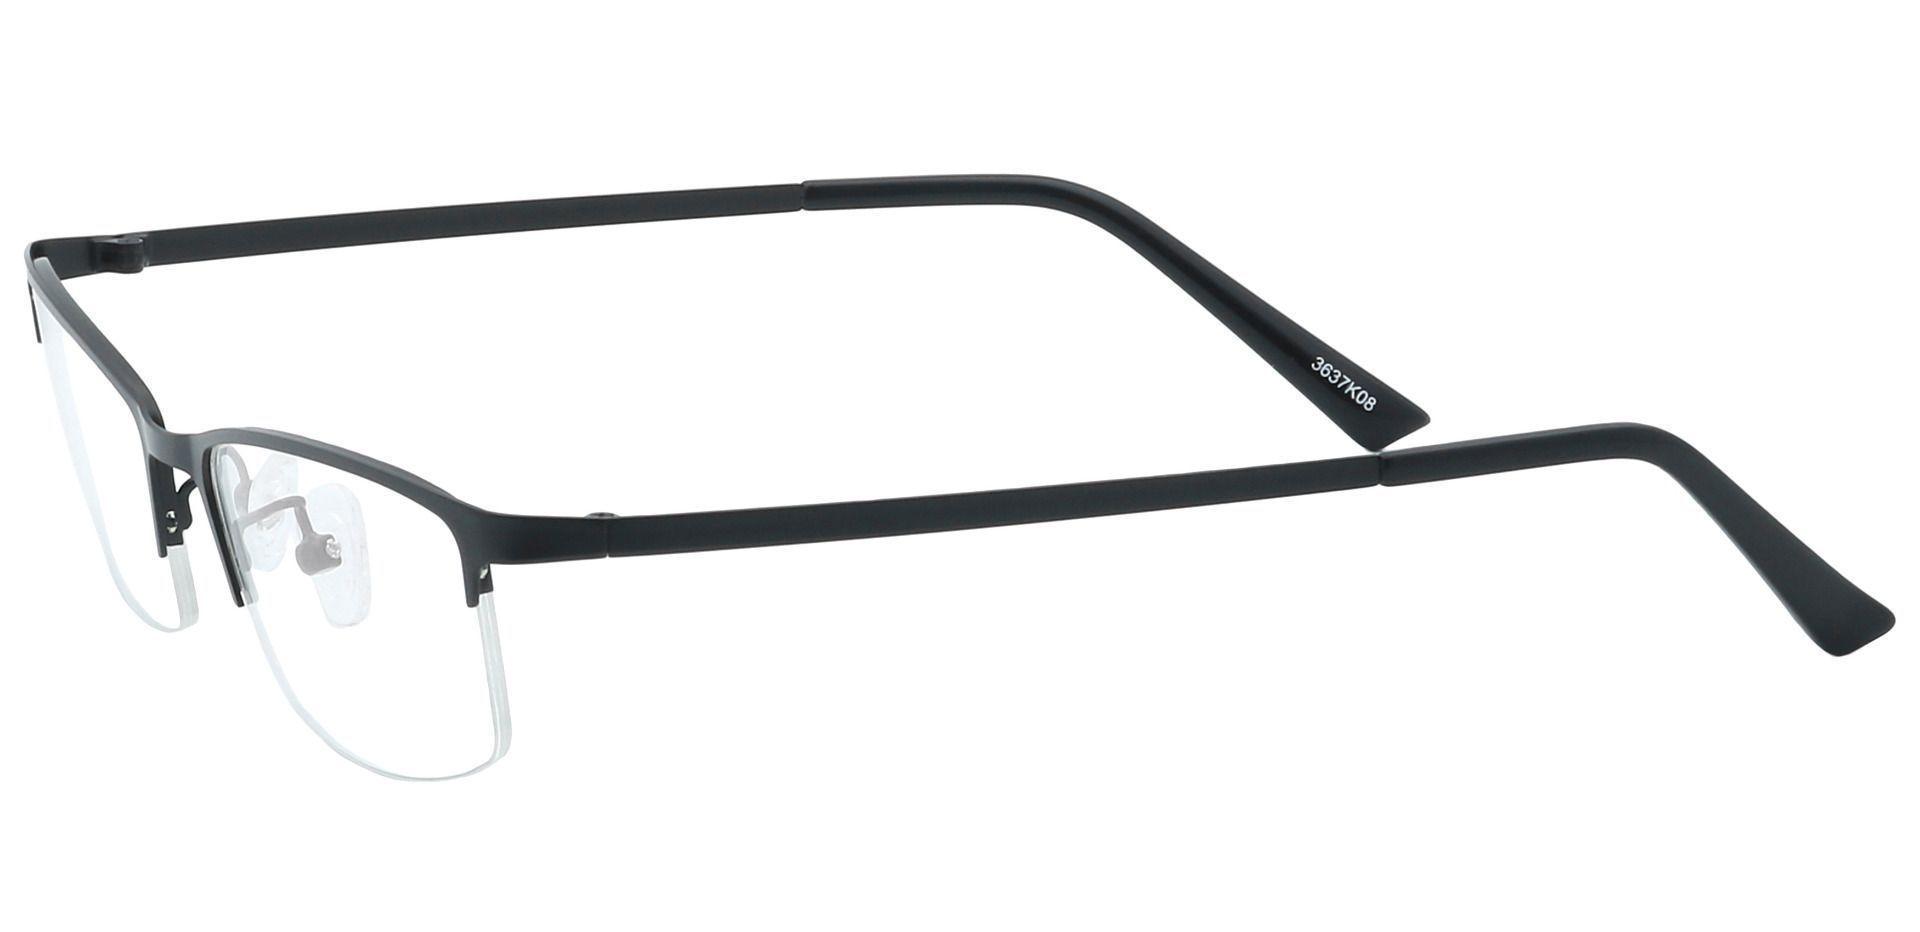 Tay Rectangle Prescription Glasses - Black